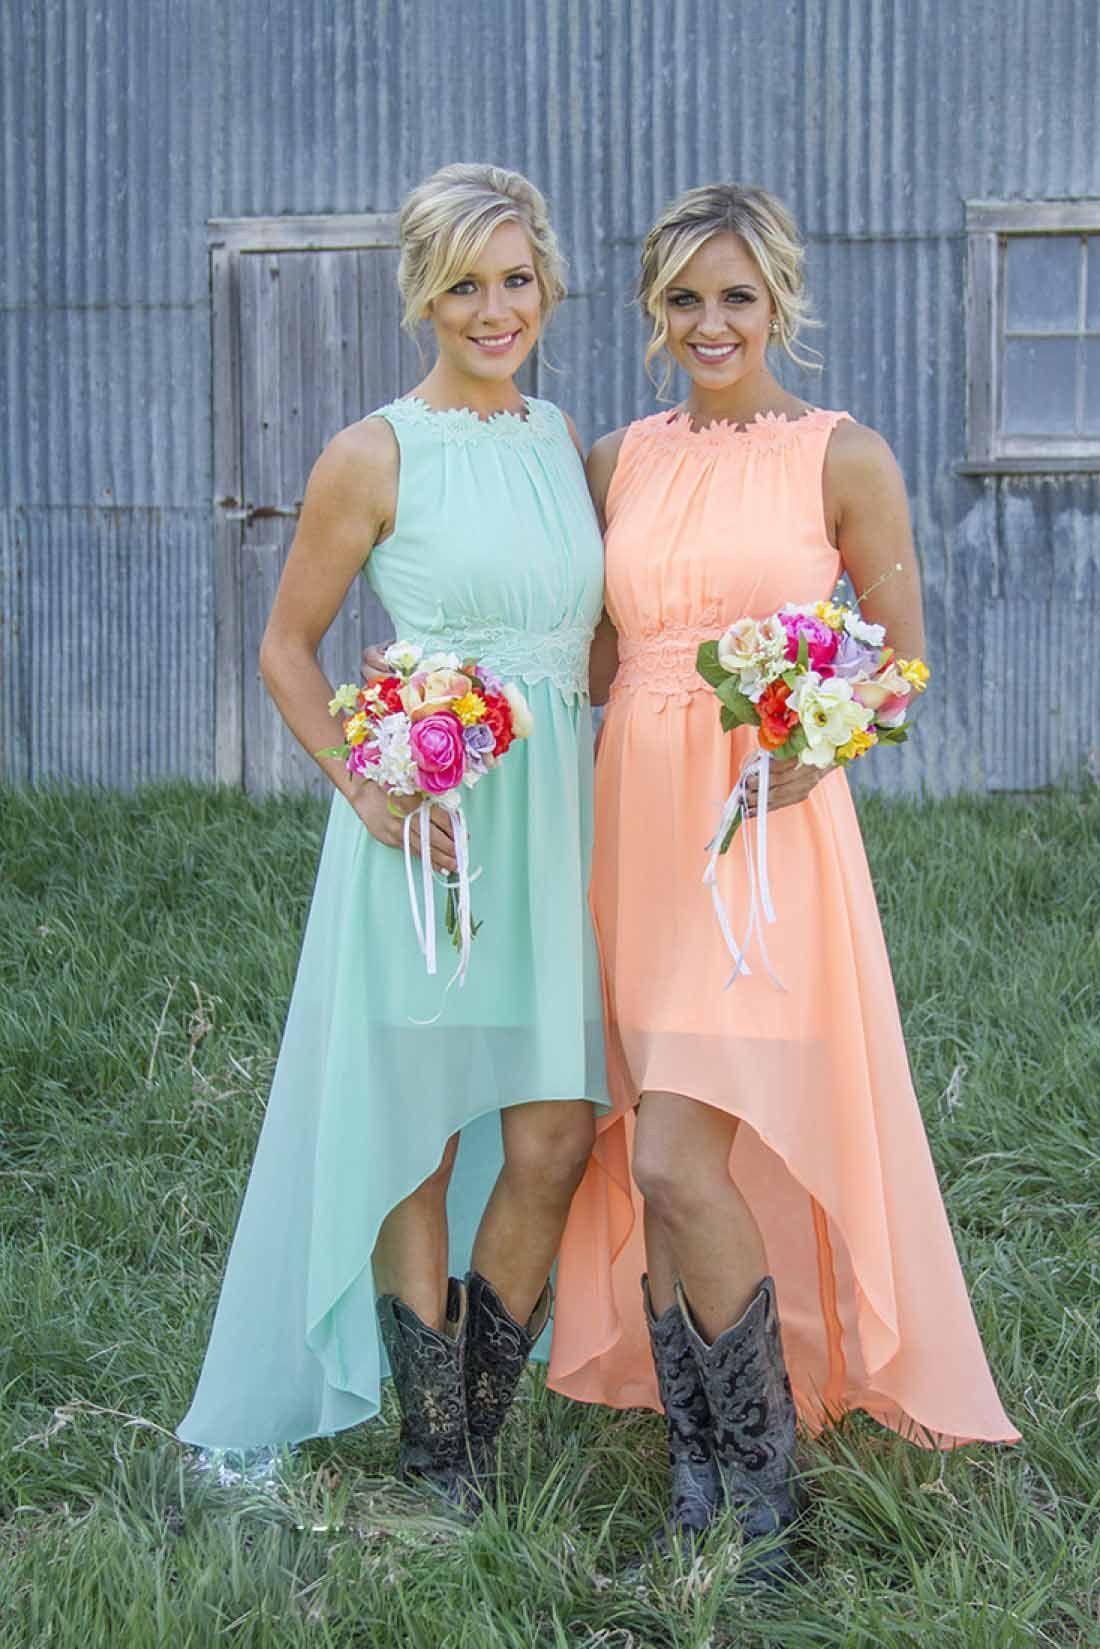 Bridesmaid Dresses with Boots,Bridesmaid Dresses Pastel,Hi-Lo ...